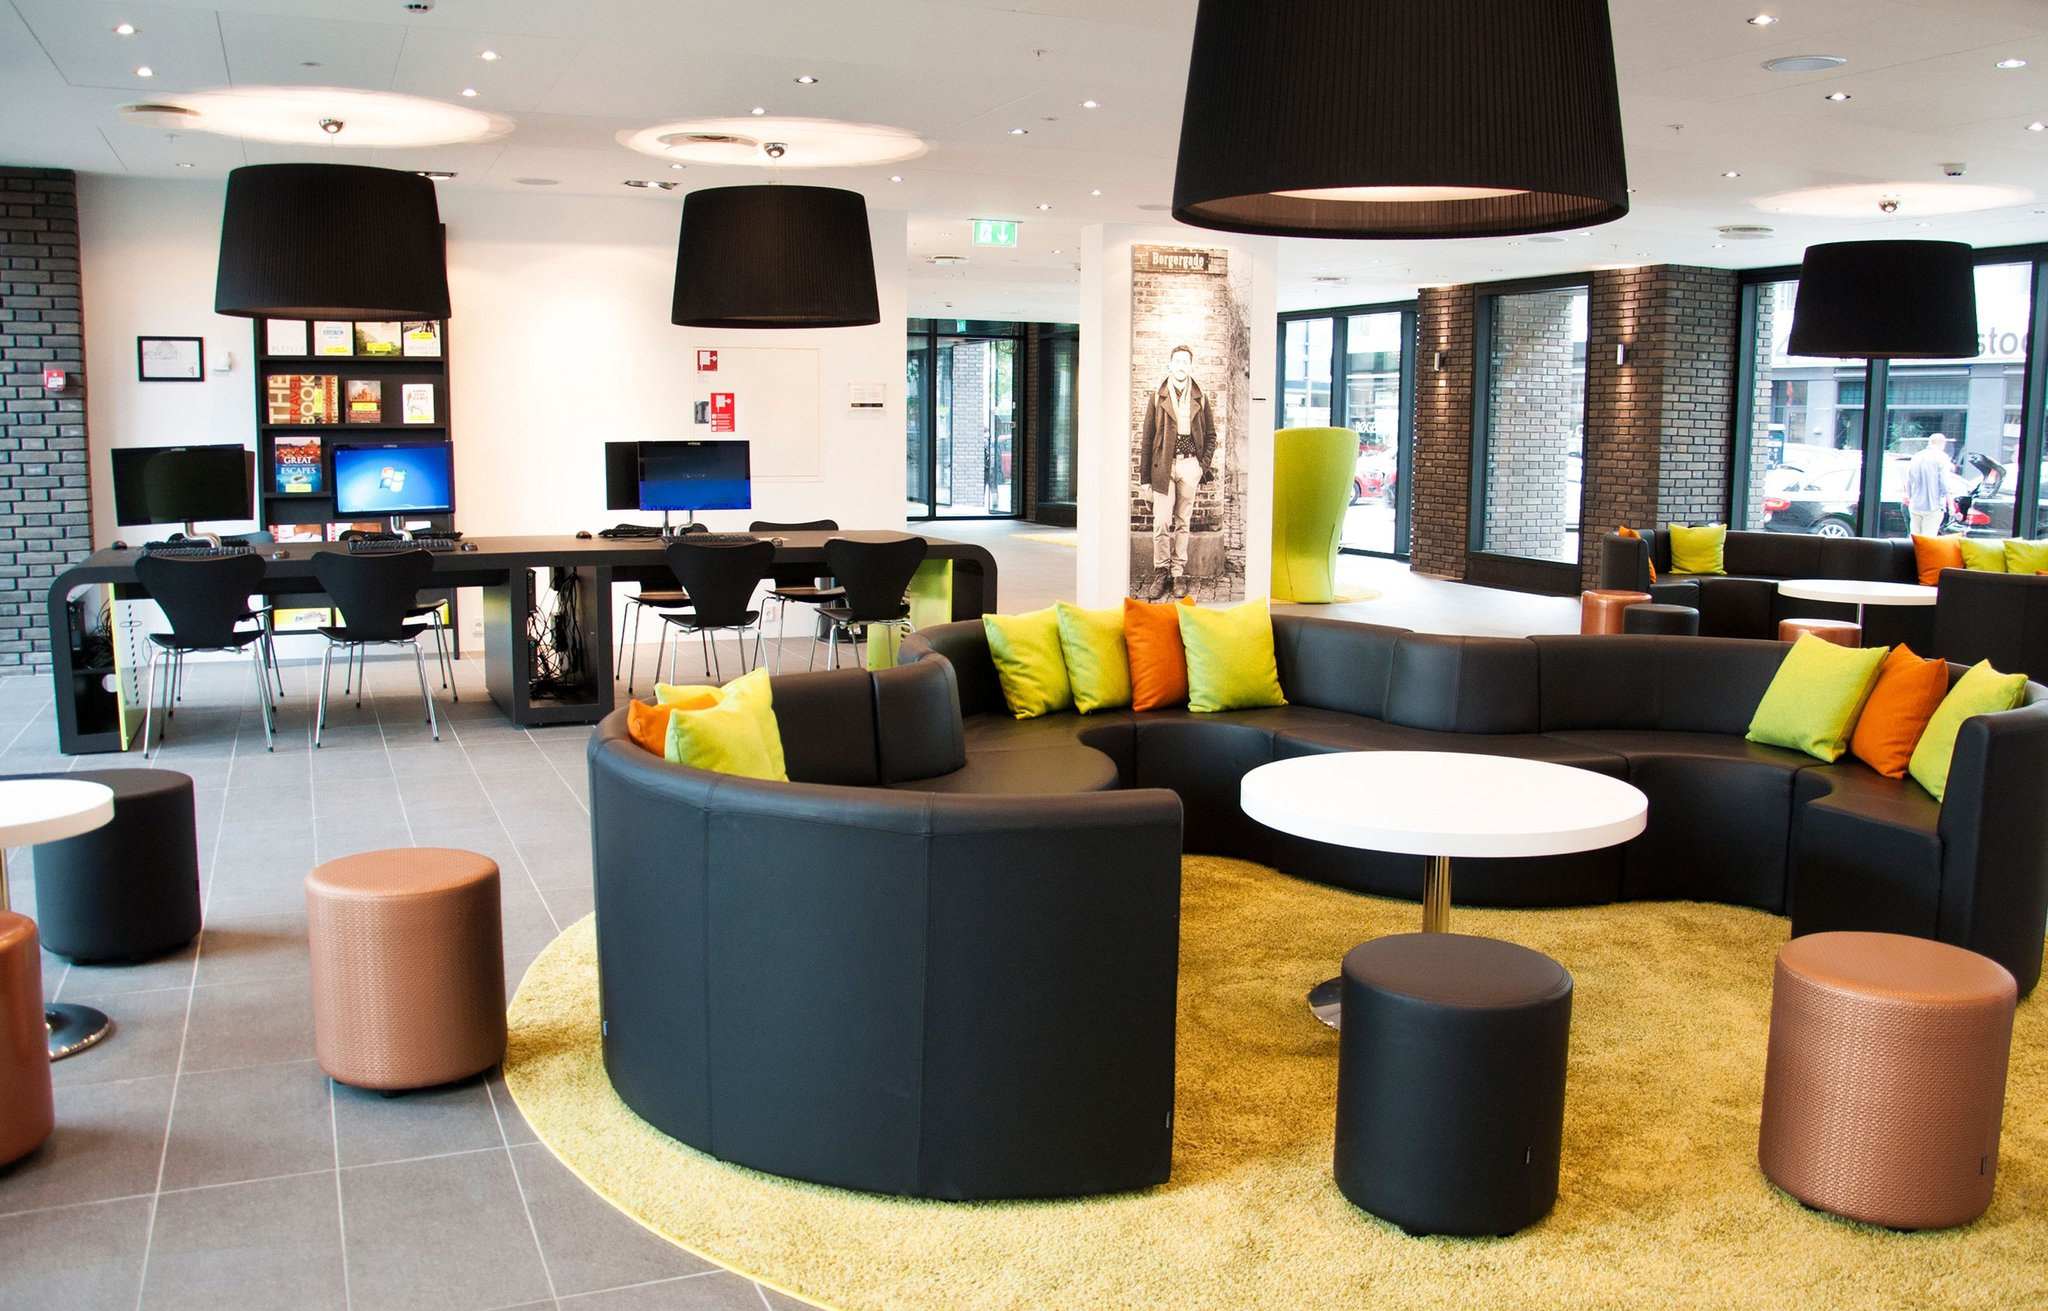 Det eksisterende Wakeup-hotel i Borgergade ved Kongens Nytorv har fortsat alle 498 værelser i drift. Men udbygningen, der vil gøre det til Danmarks tredjestørste hotel, er udskudt. Pressefoto: Arp-Hansen Hotel Group.